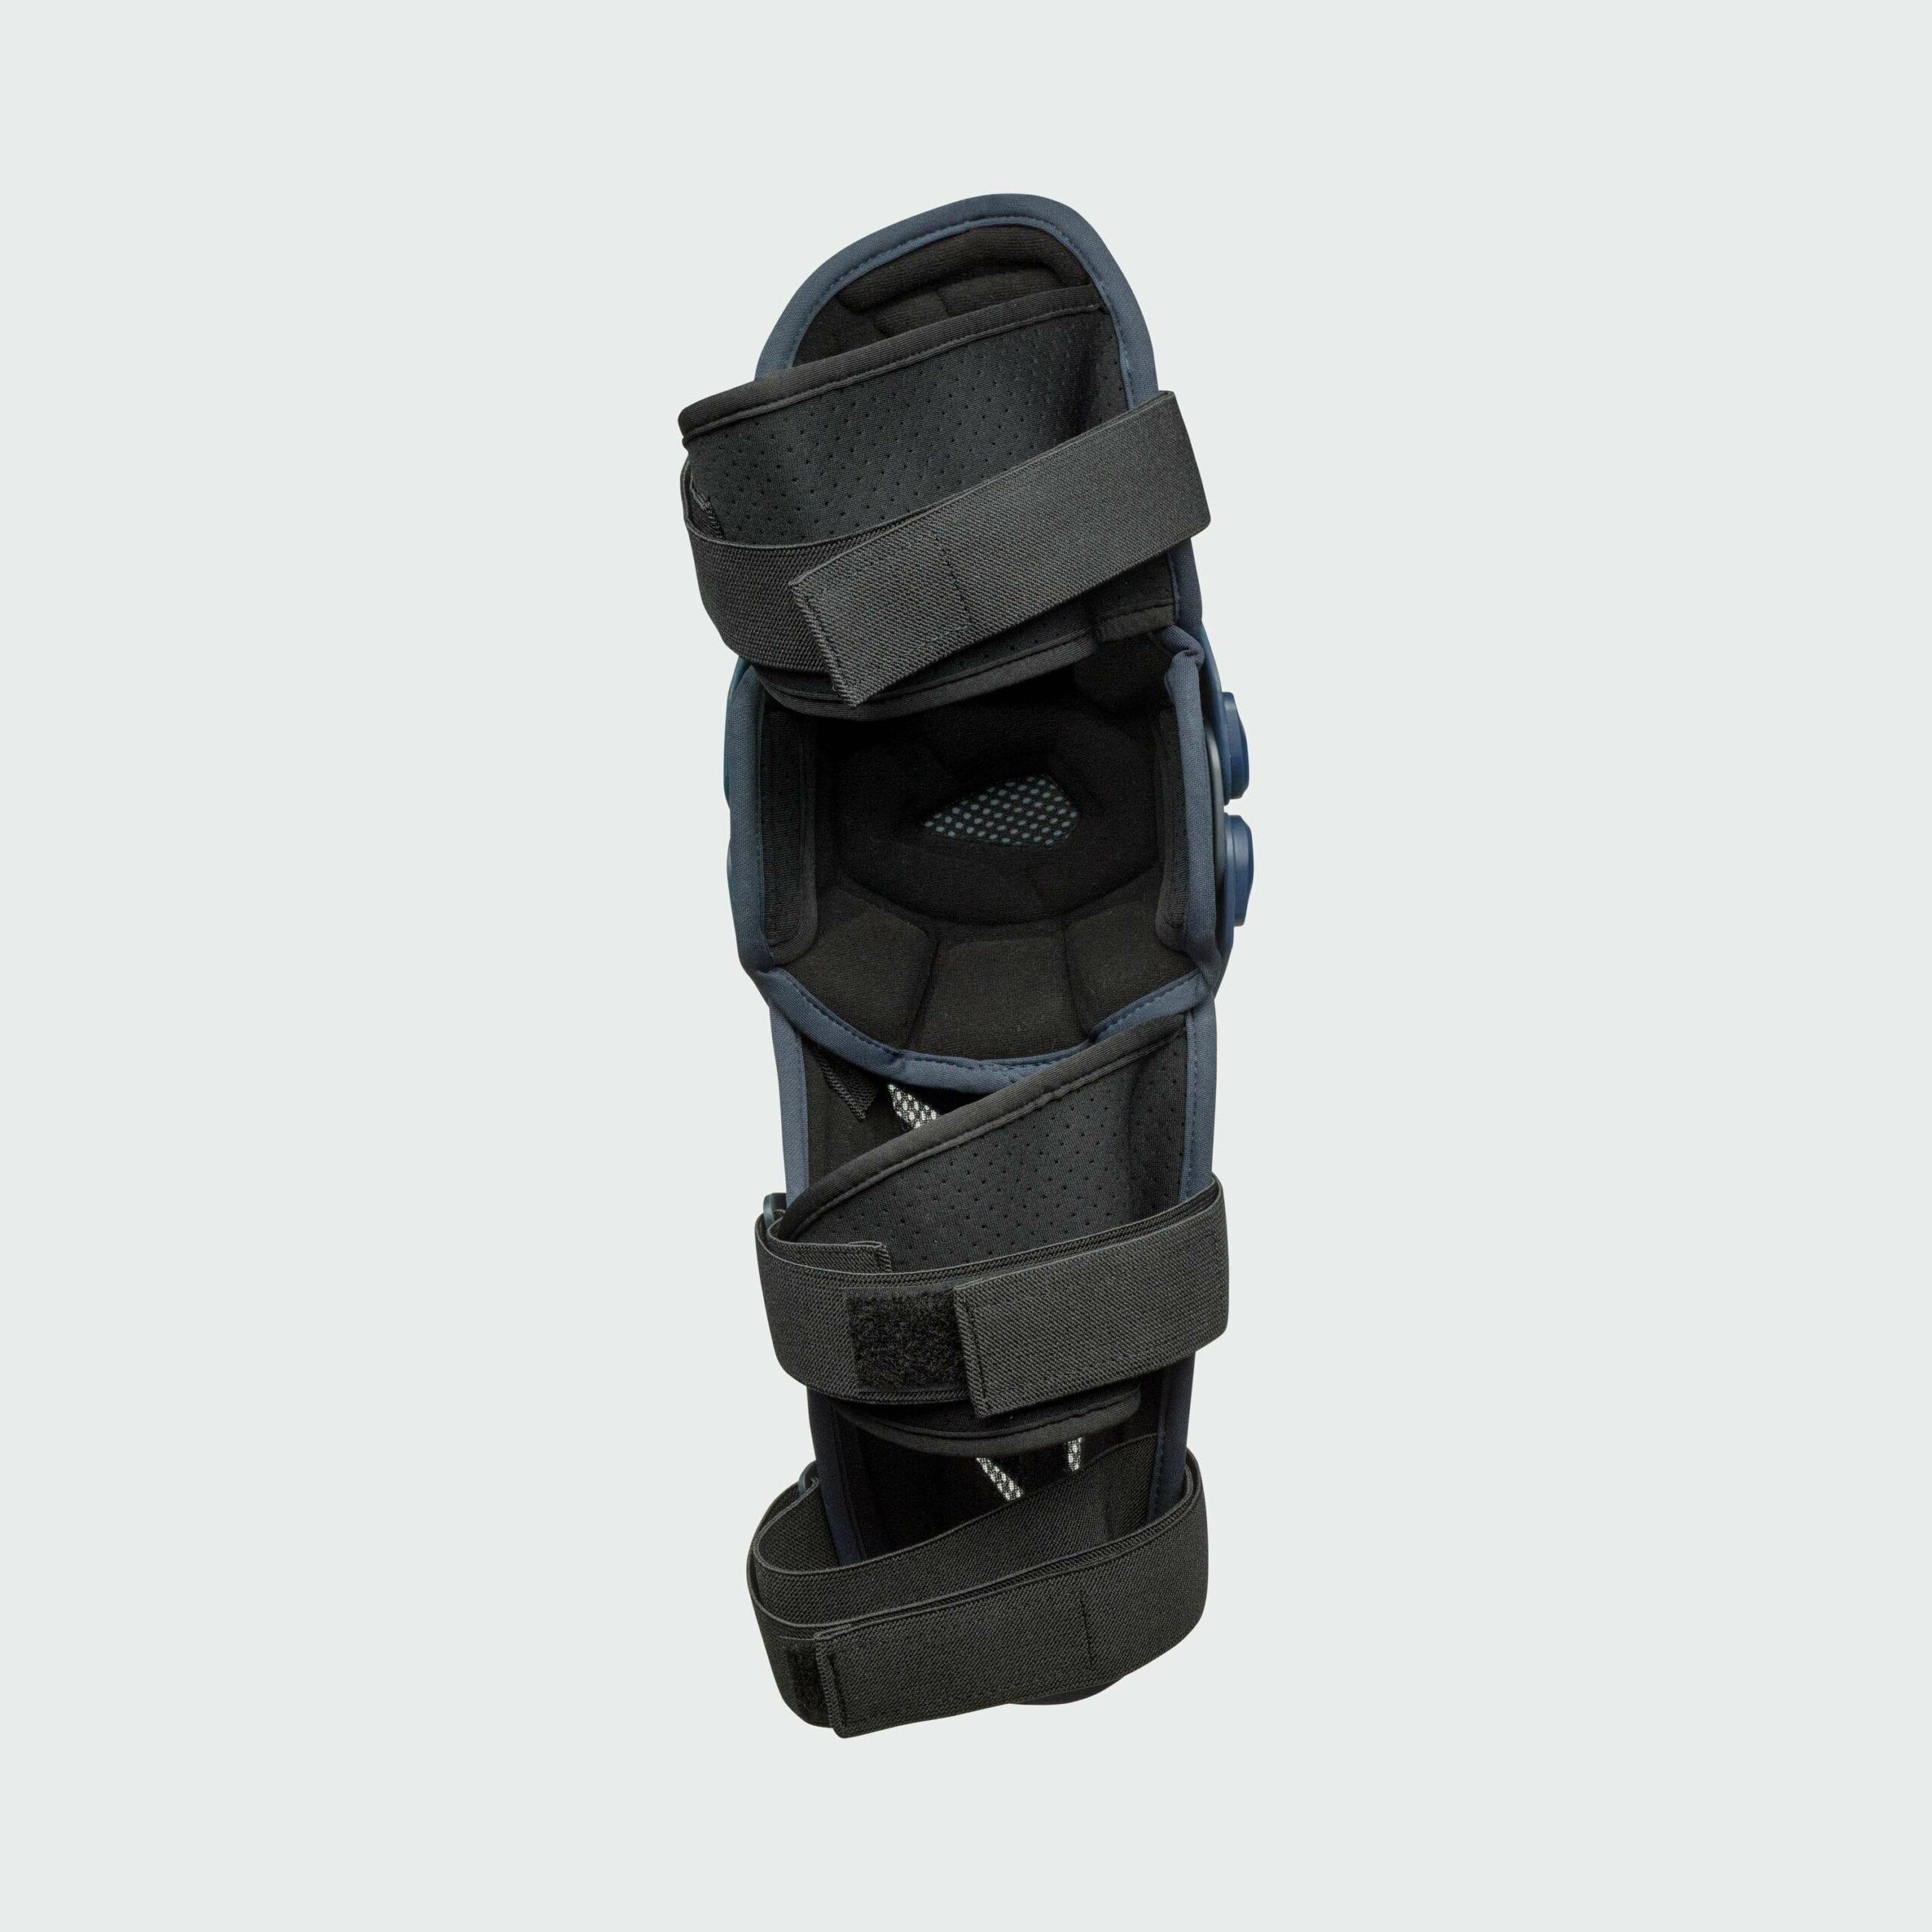 3HS192530X Dual Axis Knee Guard